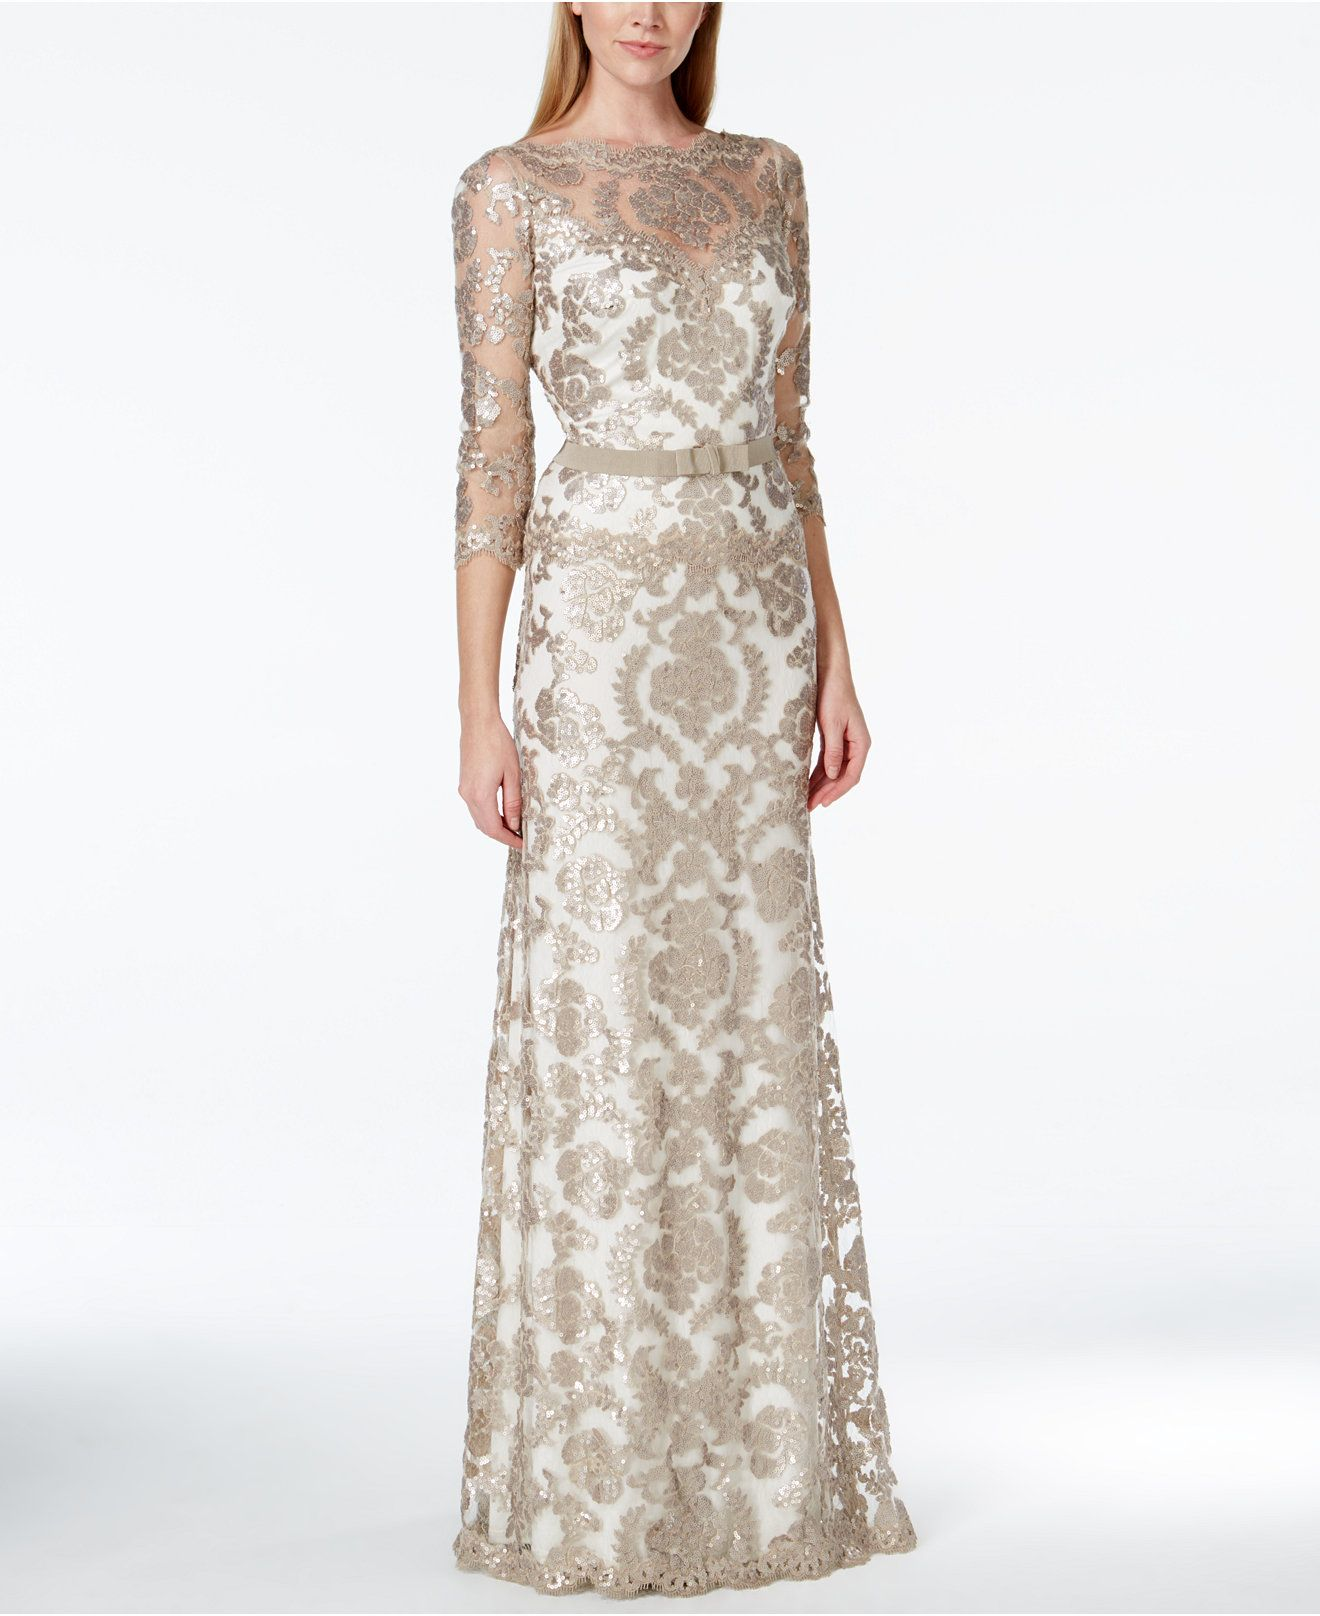 b6ee8bad763c Tadashi Shoji Damask Sequin Lace Bow Gown - Dresses - Women - Macy's ...